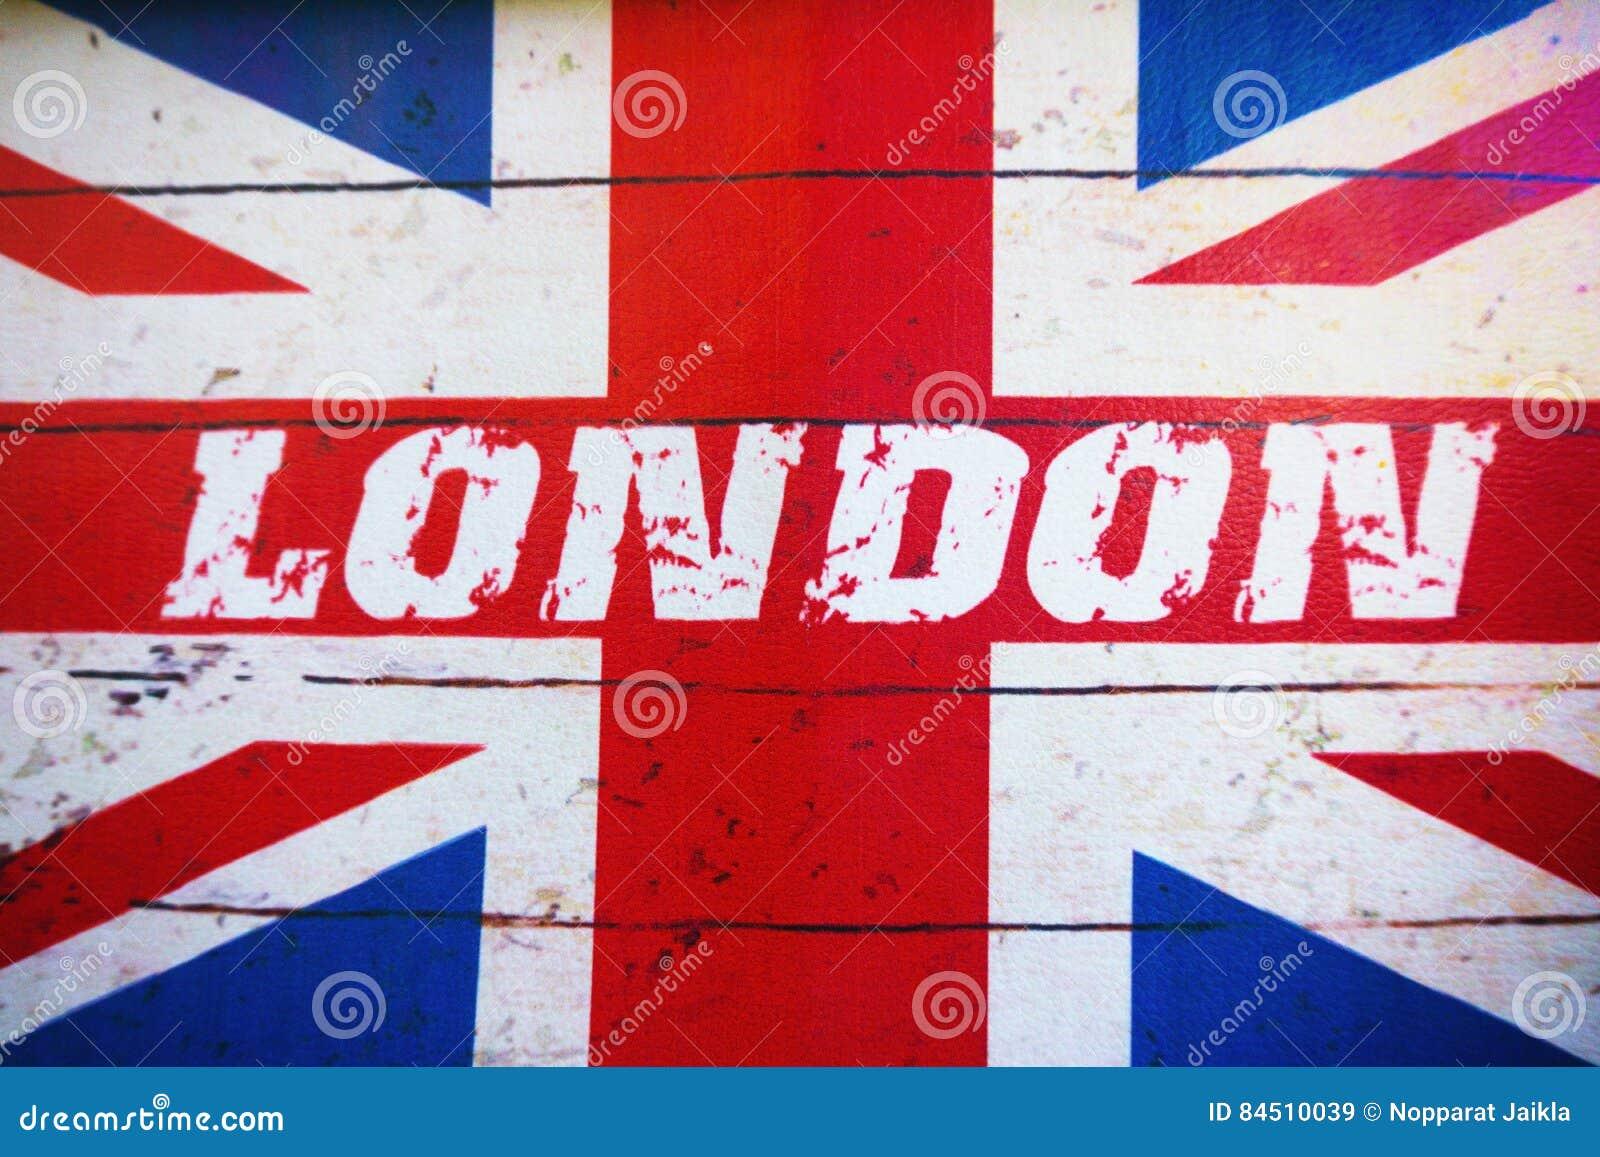 Old Fashioned English Flag